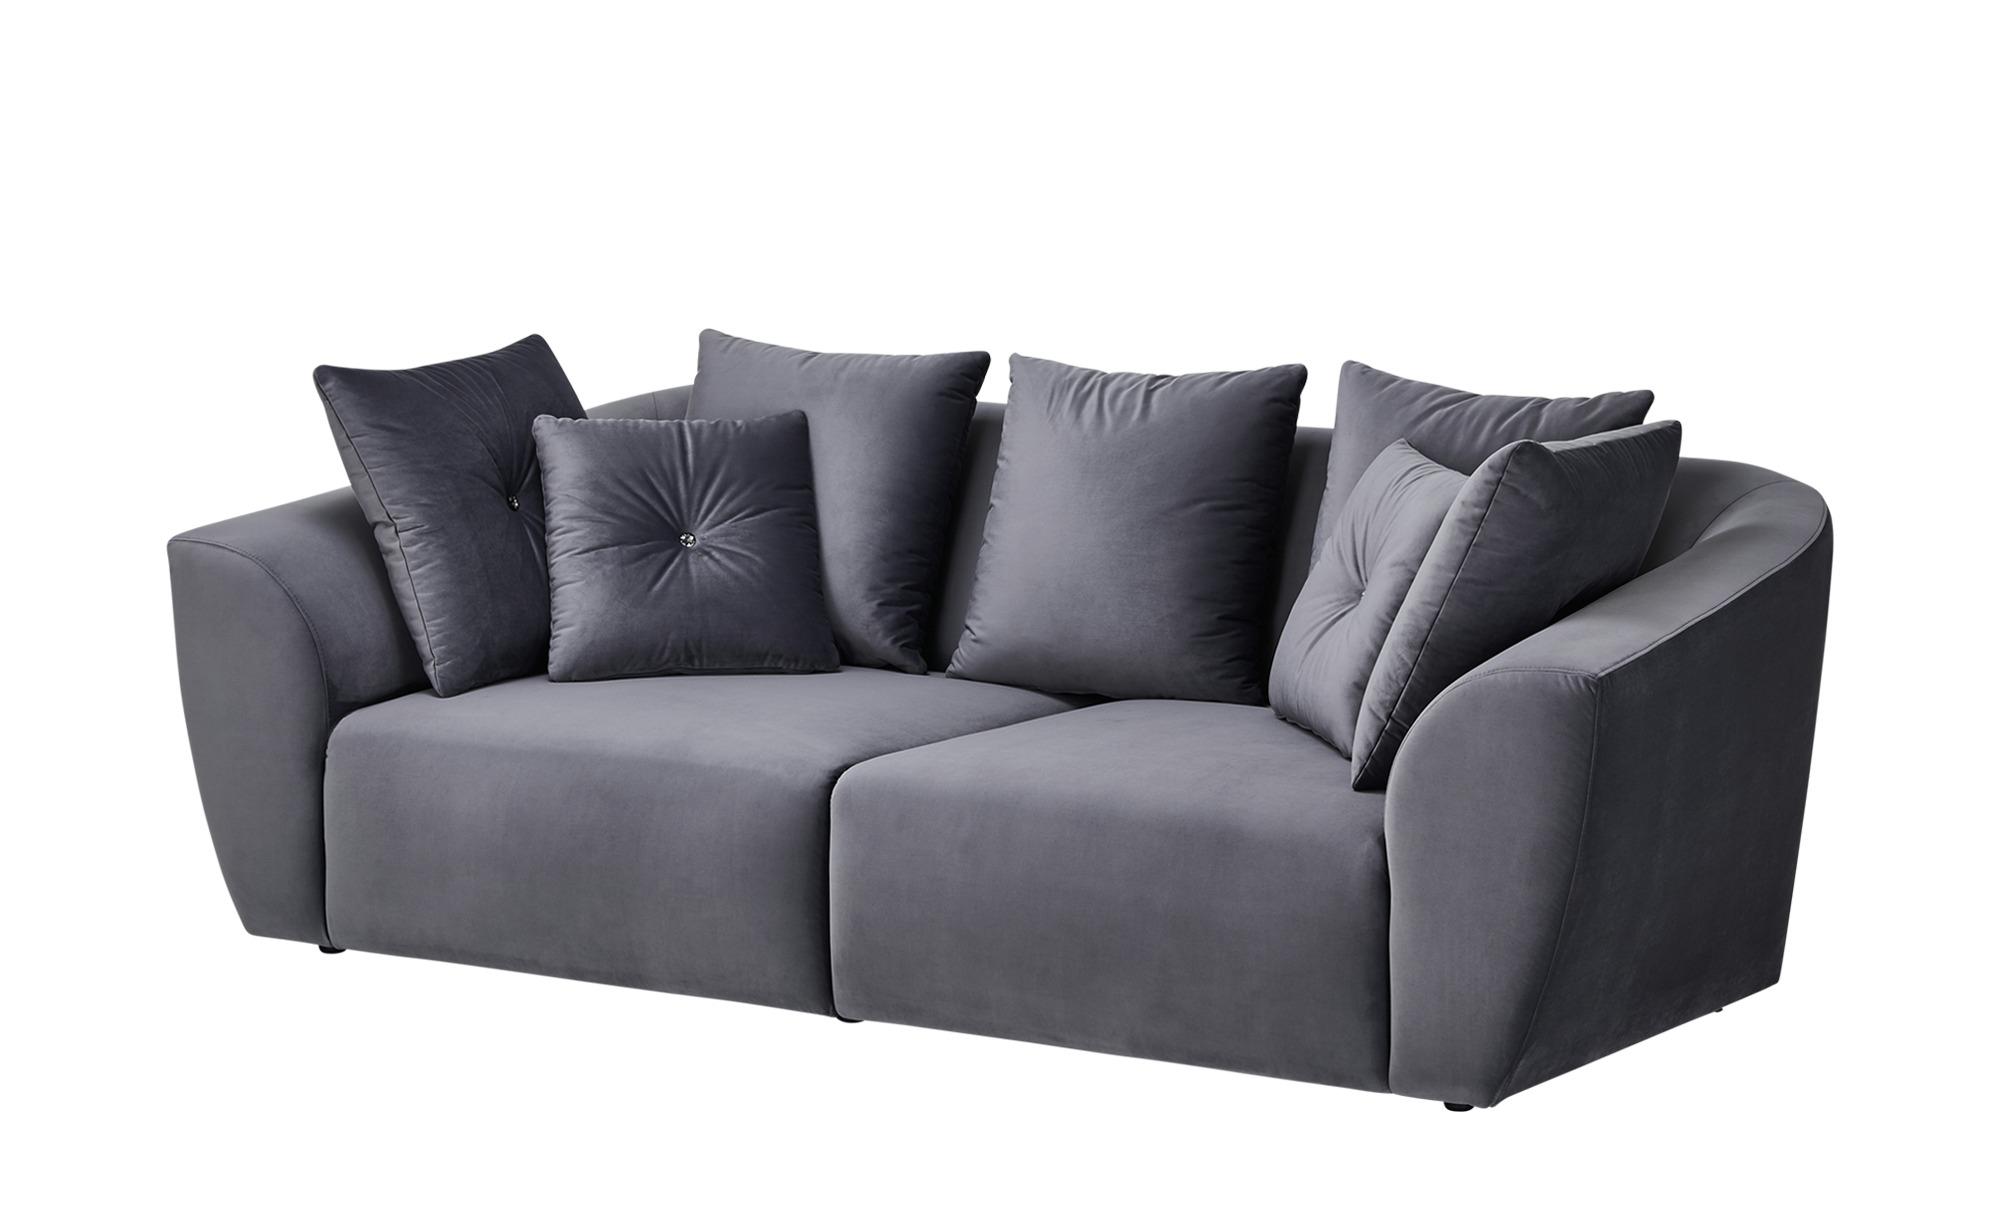 smart Big Sofa Krista, gefunden bei Möbel Höffner